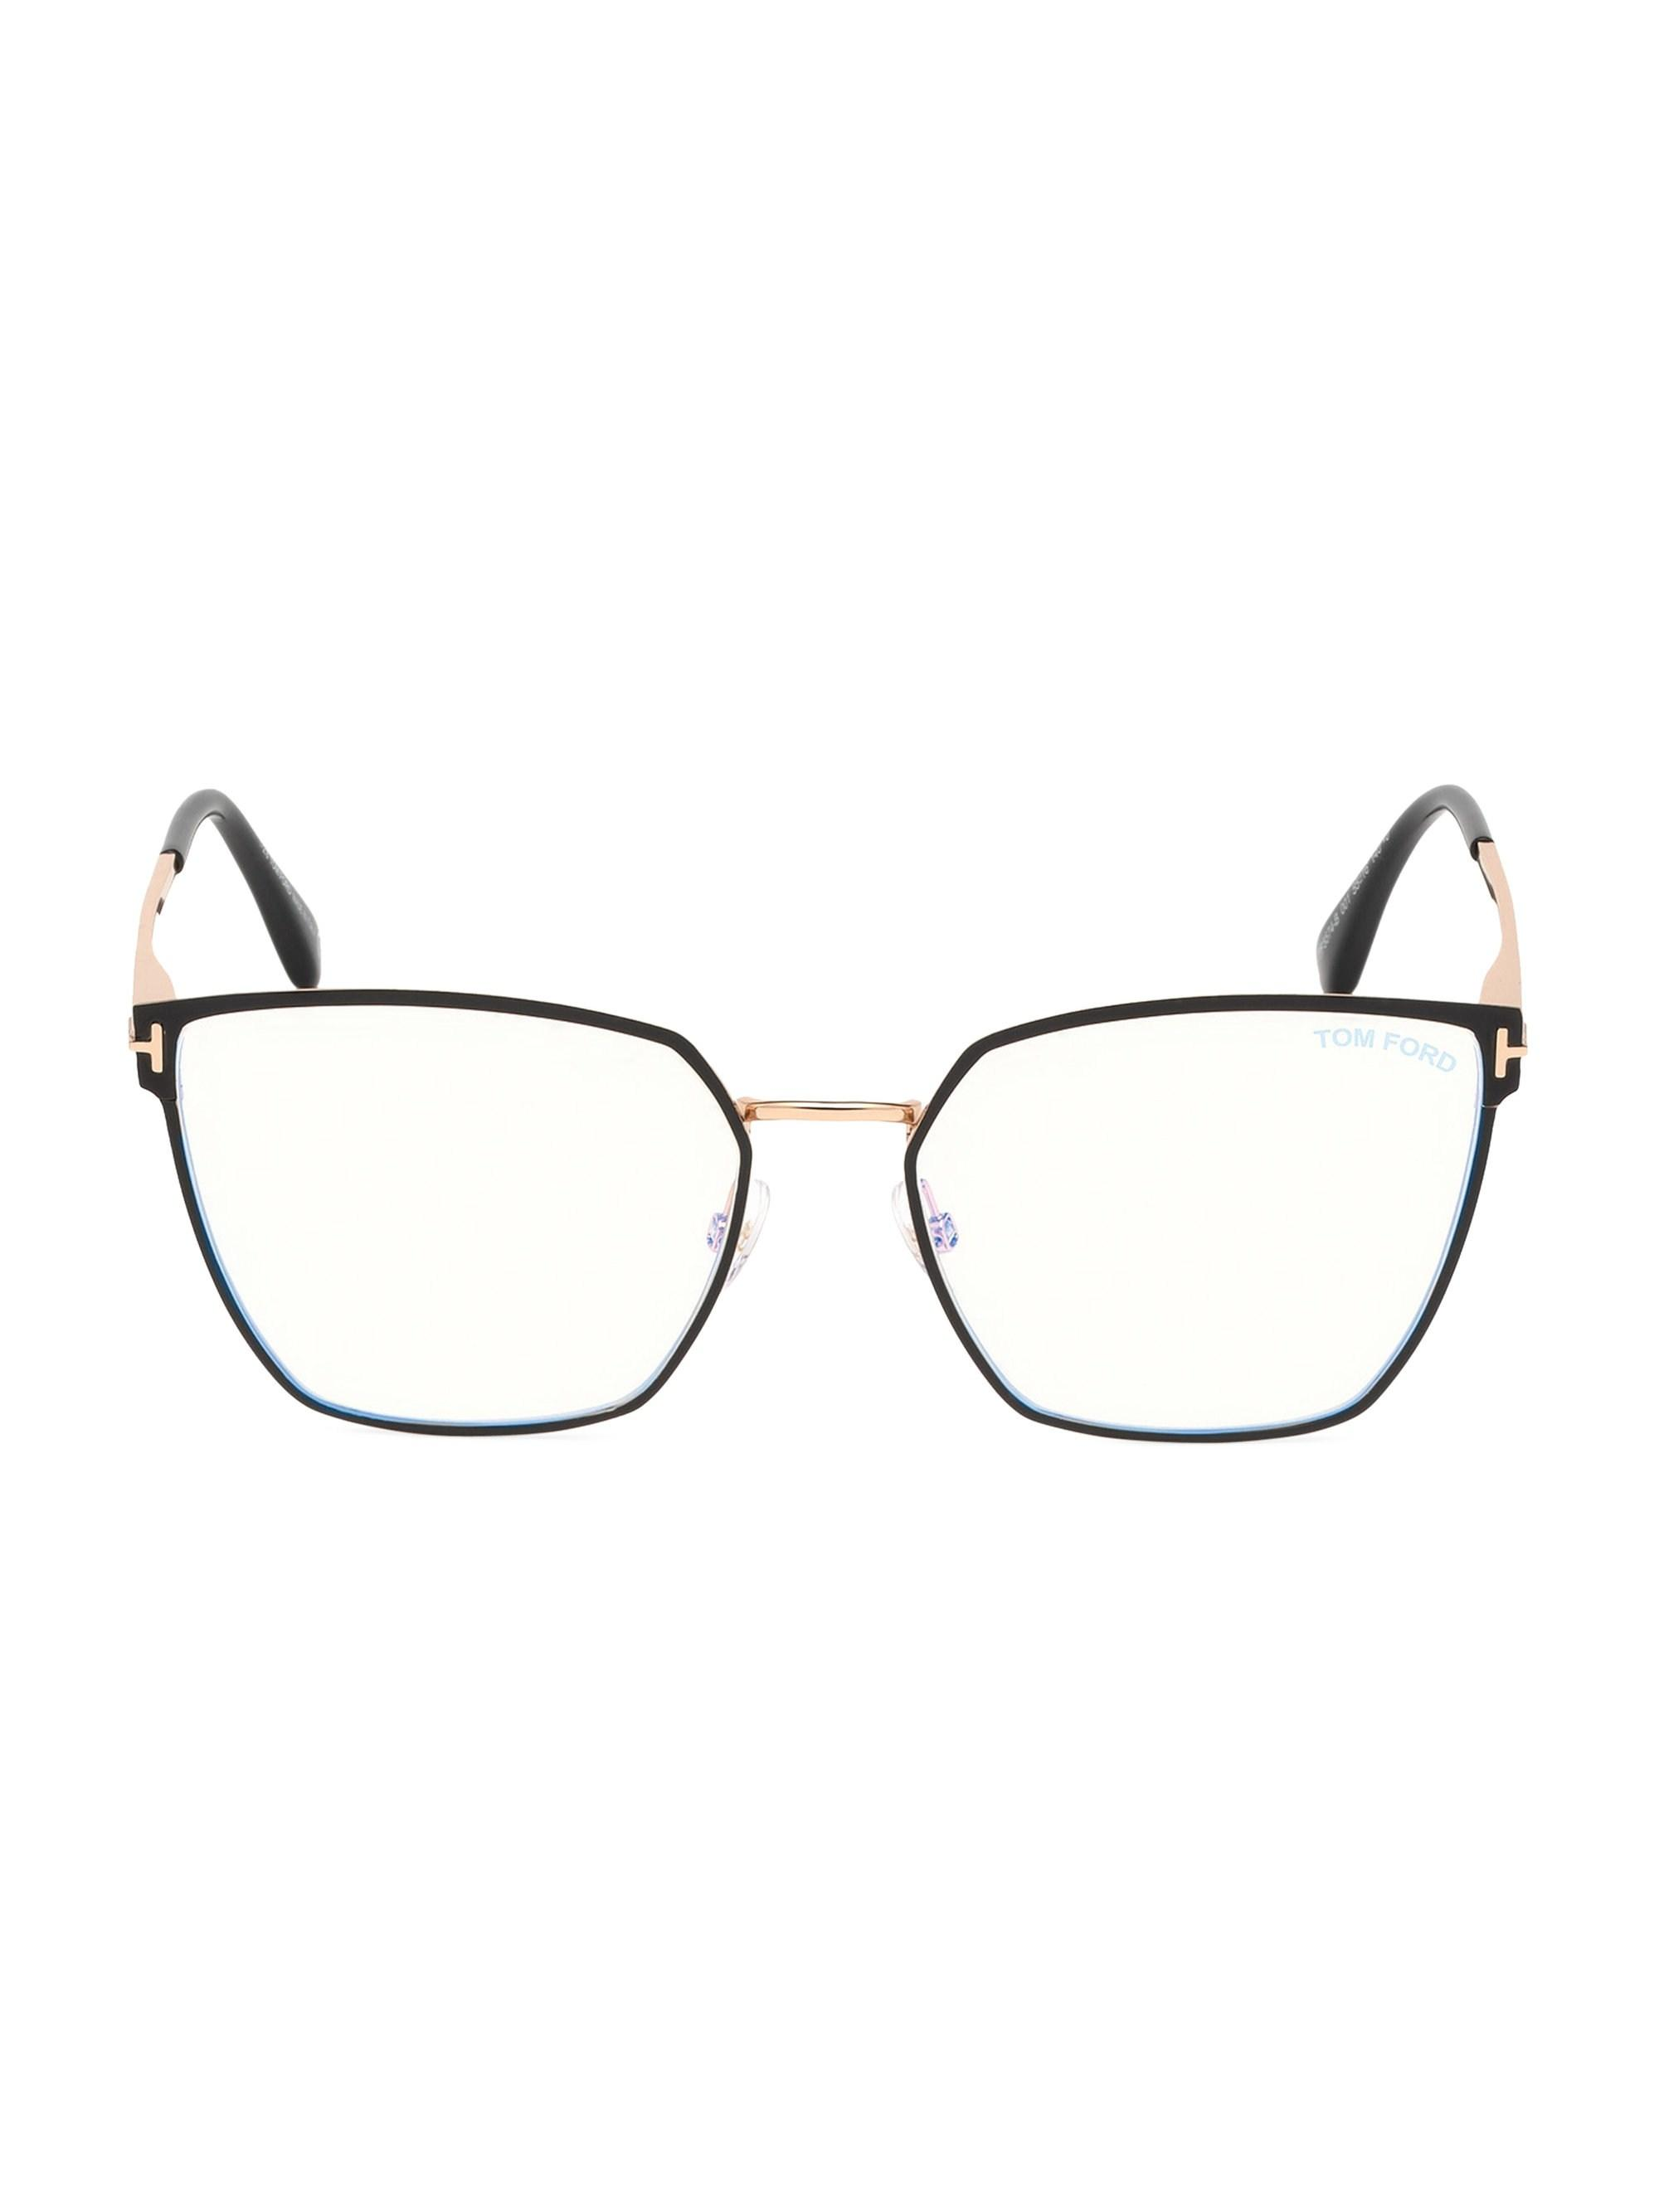 ad74272652 Tom Ford - Black 56mm Angular Metal Blue Block Glasses - Lyst. View  fullscreen